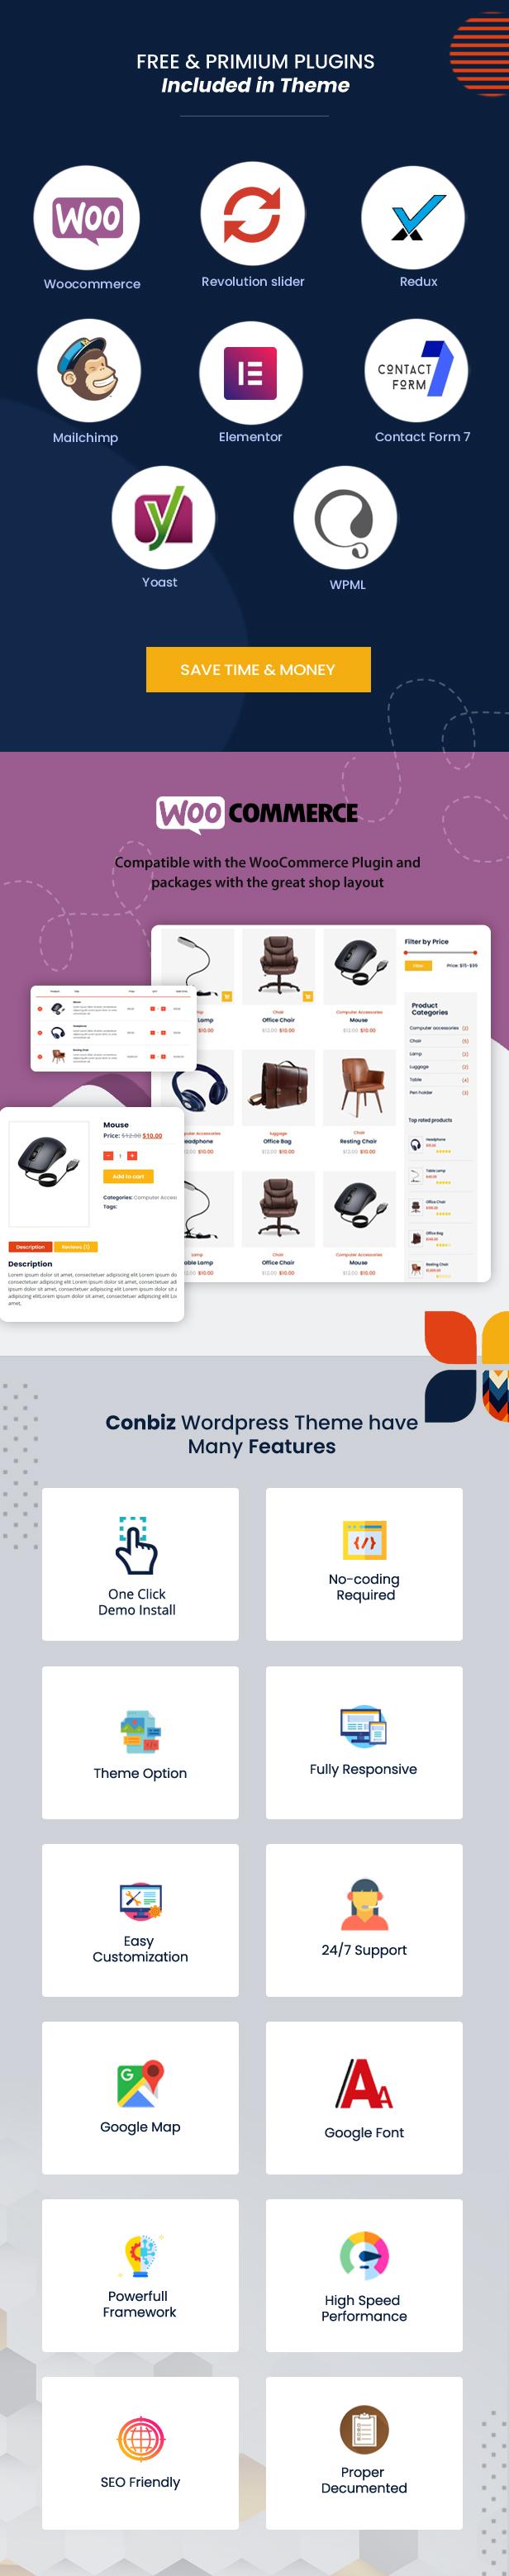 Conbiz – Business & Consulting WordPress Theme - 8